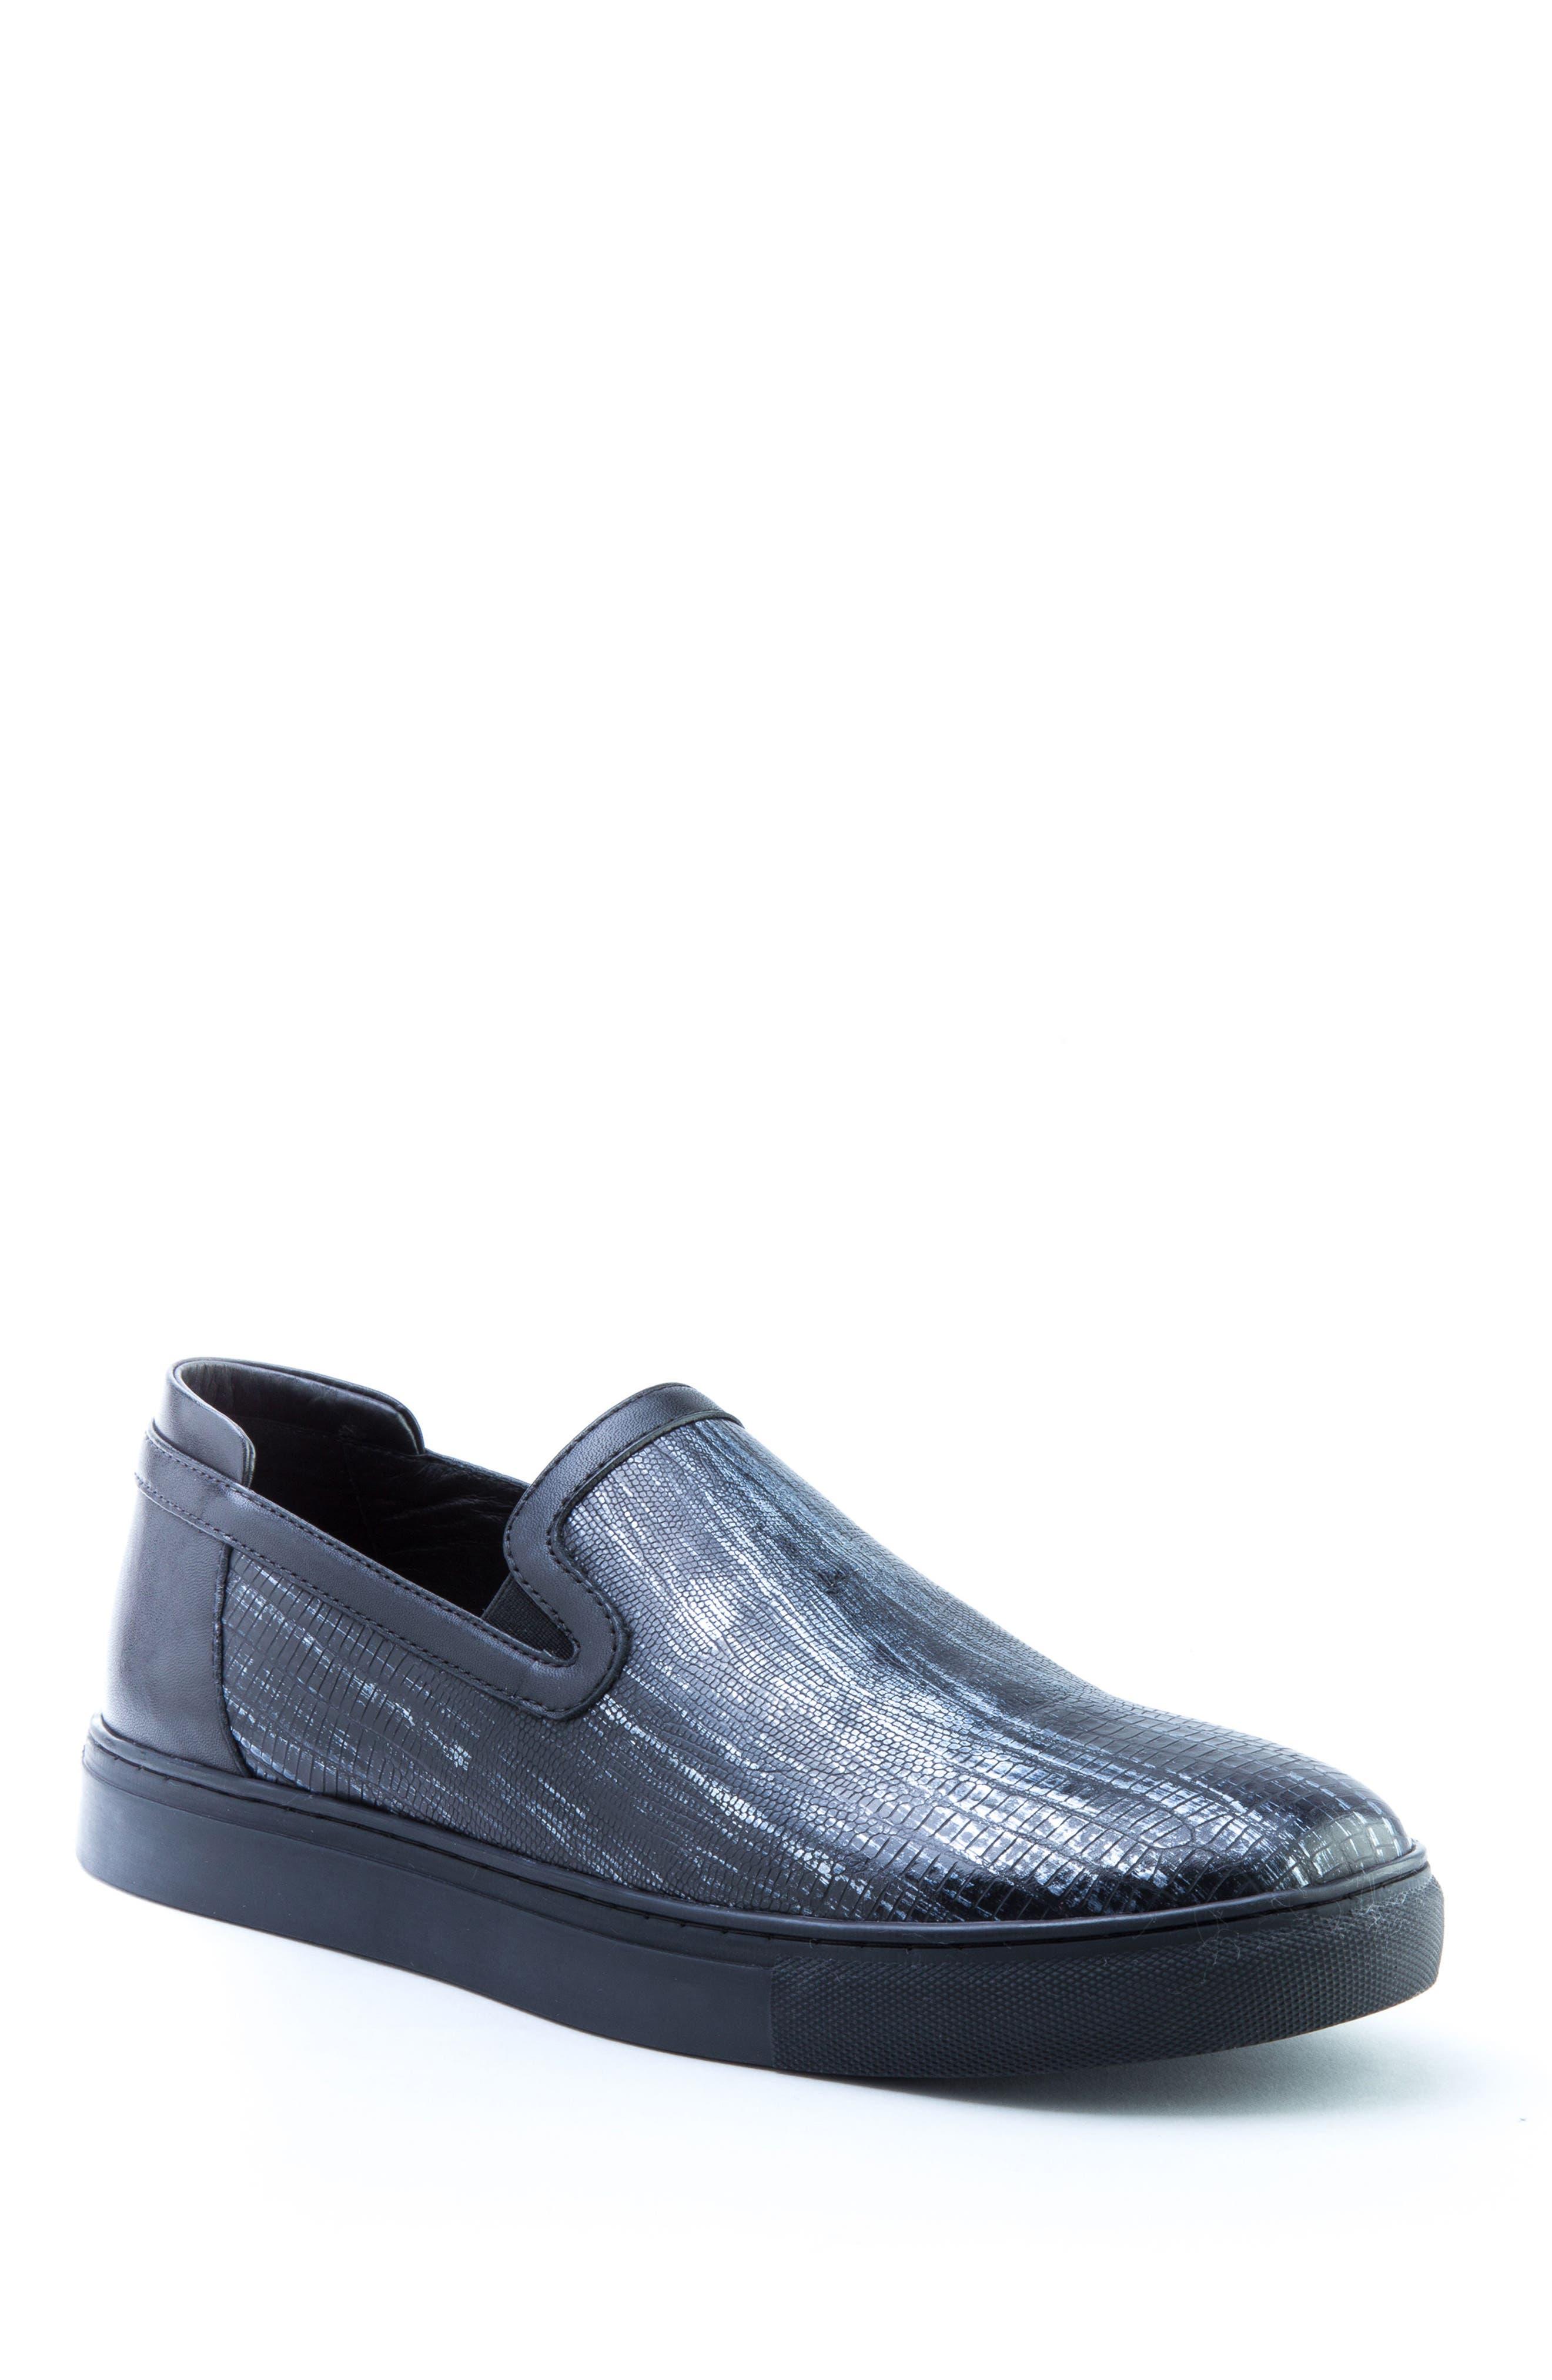 BADGLEY MISCHKA COLLECTION Badgley Mischka Bogart Sneaker, Main, color, BLACK LEATHER